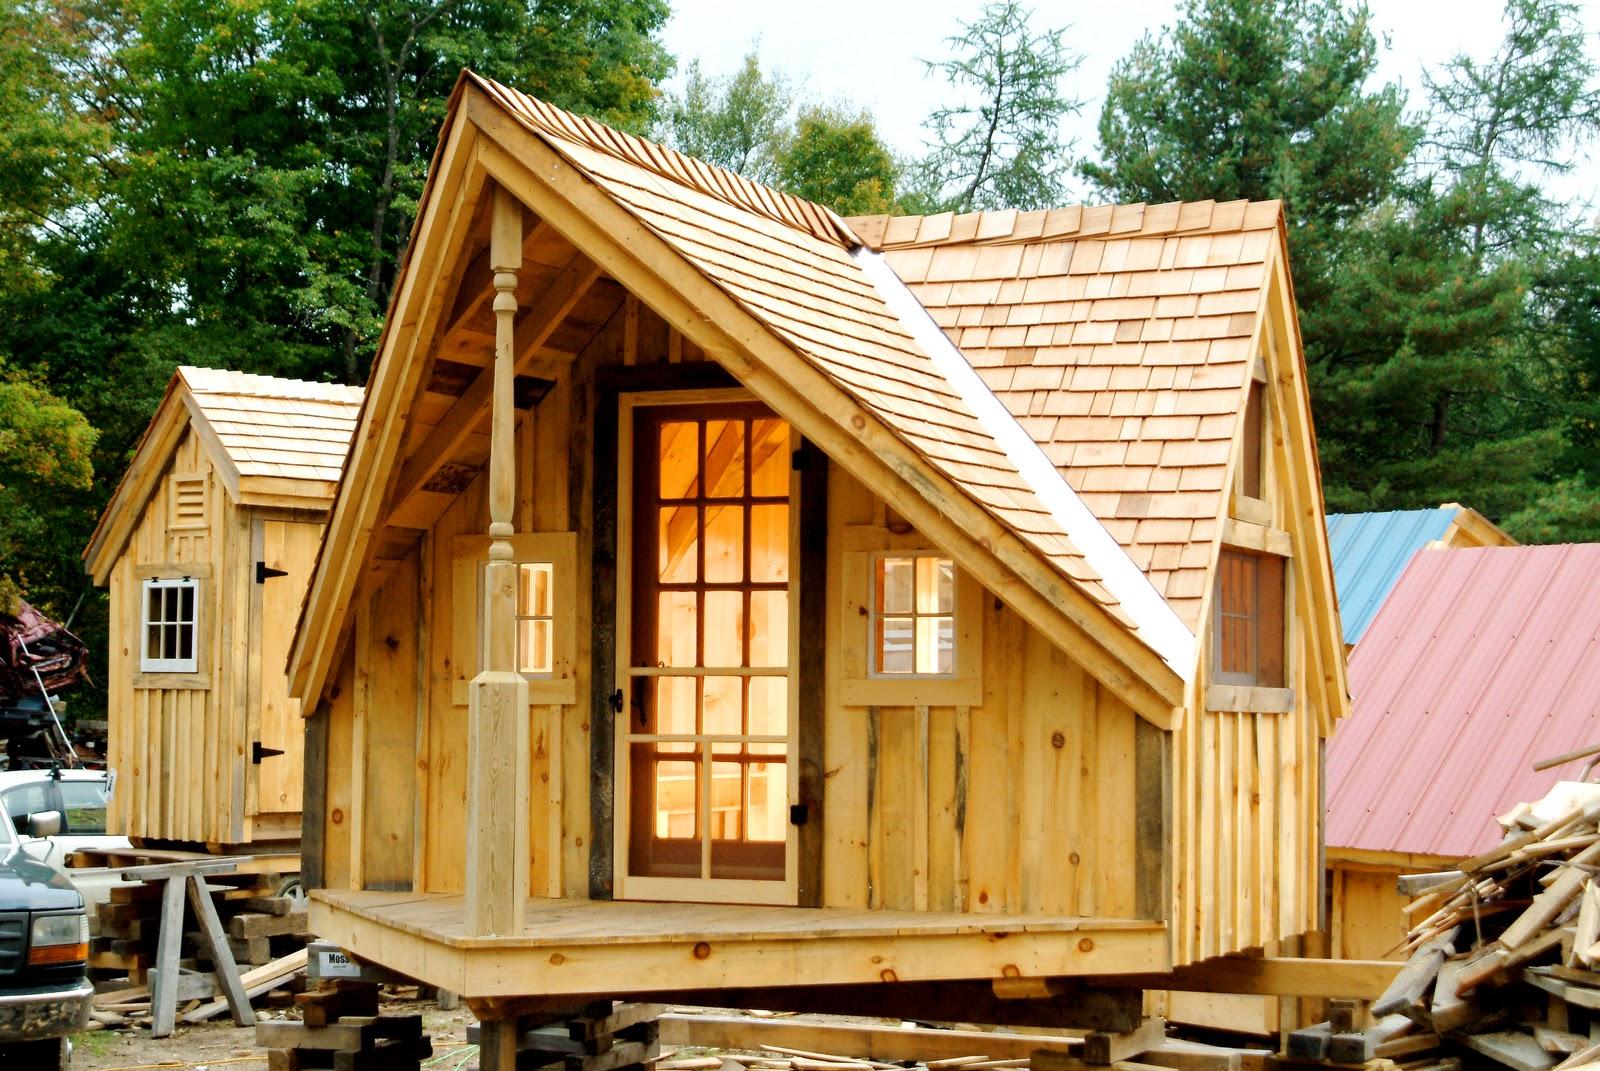 Relaxshacks.com: SIX FREE PLAN SETS For Tiny Houses/Cabins